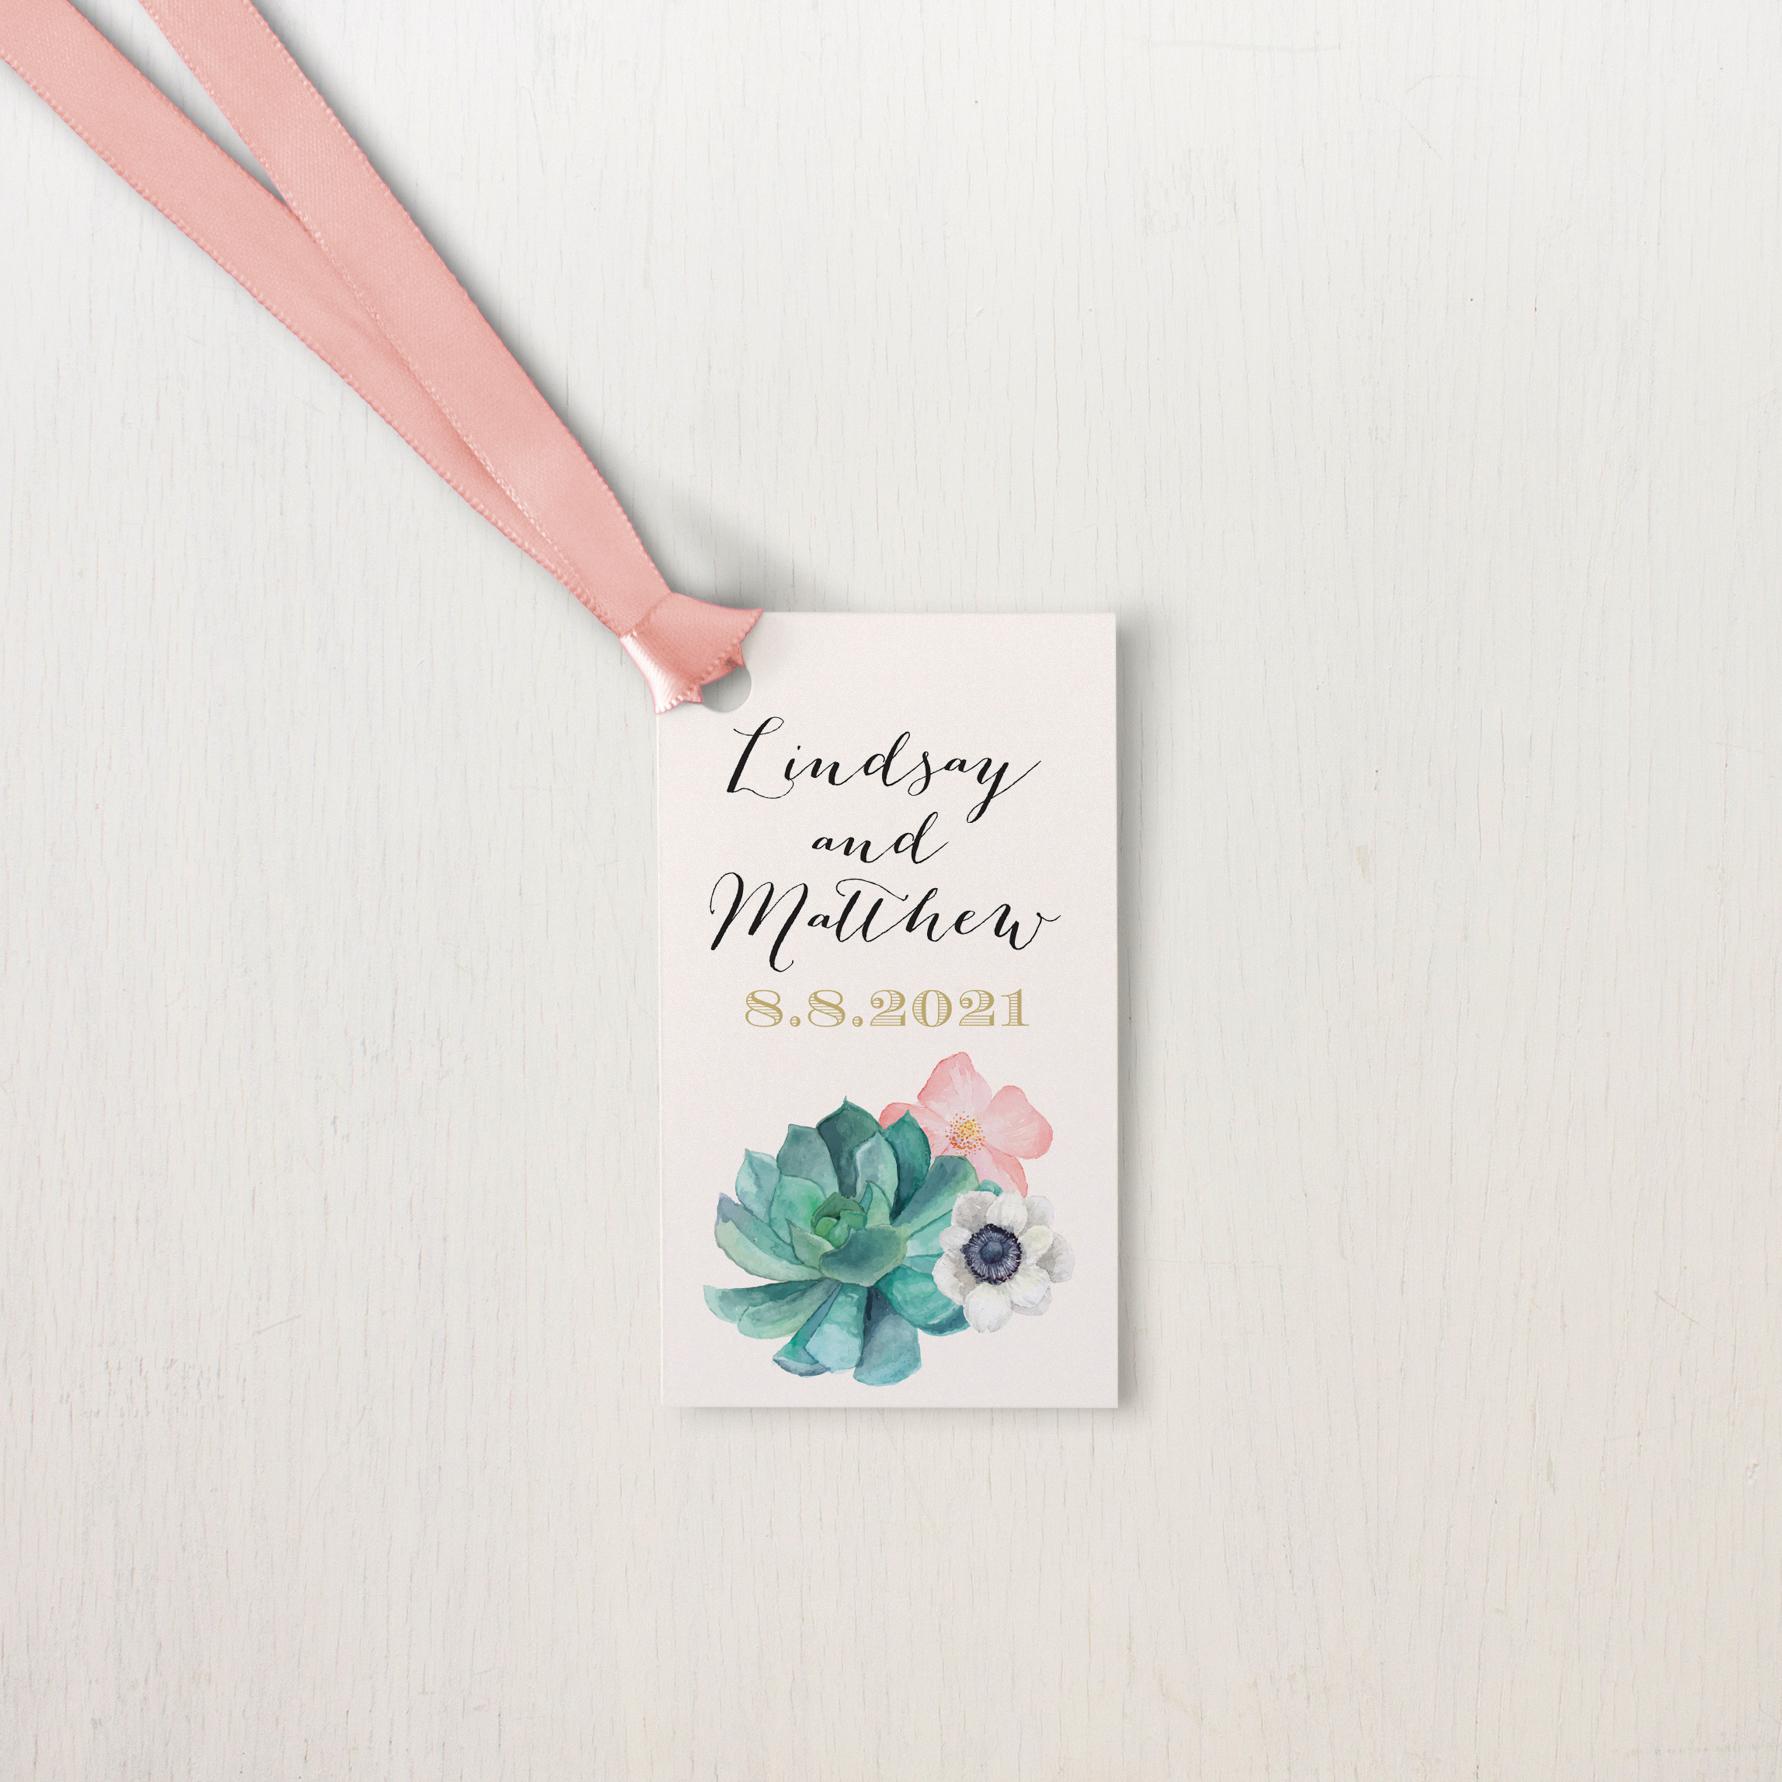 Blush Succulent Customizable Wedding Favor Tags | Beacon Lane